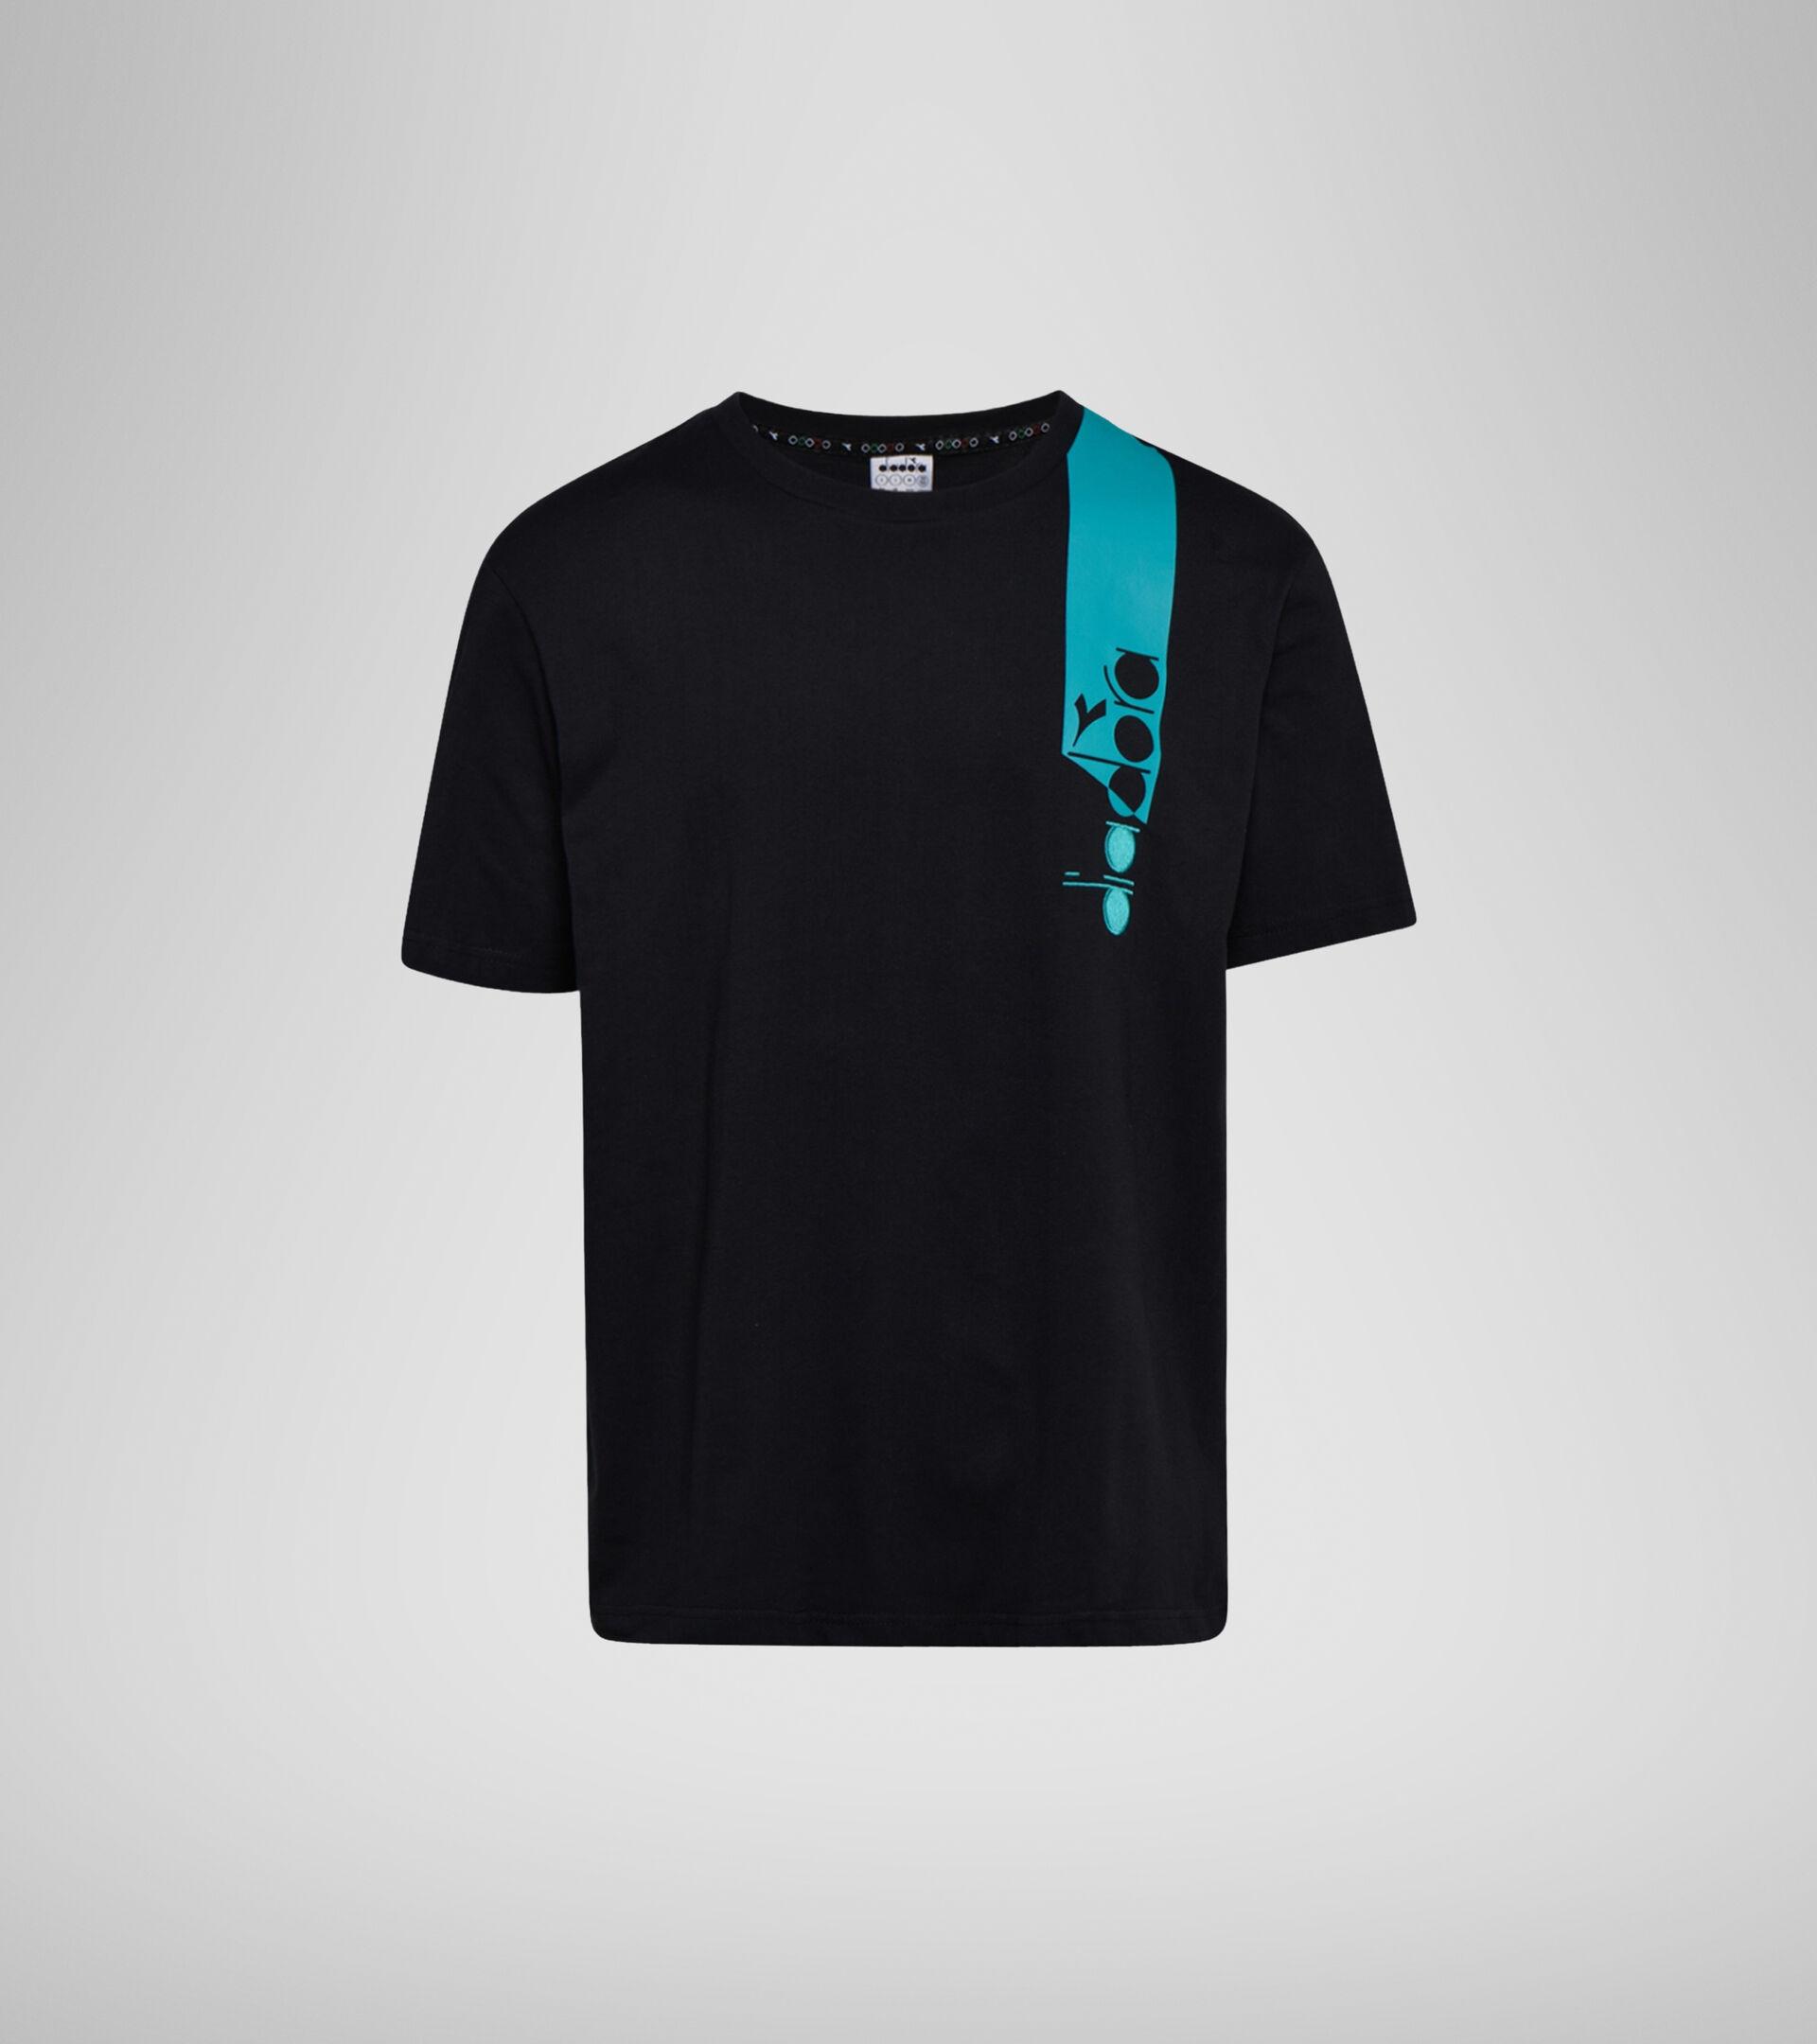 Apparel Sportswear UOMO T-SHIRT SS ICON BLACK Diadora